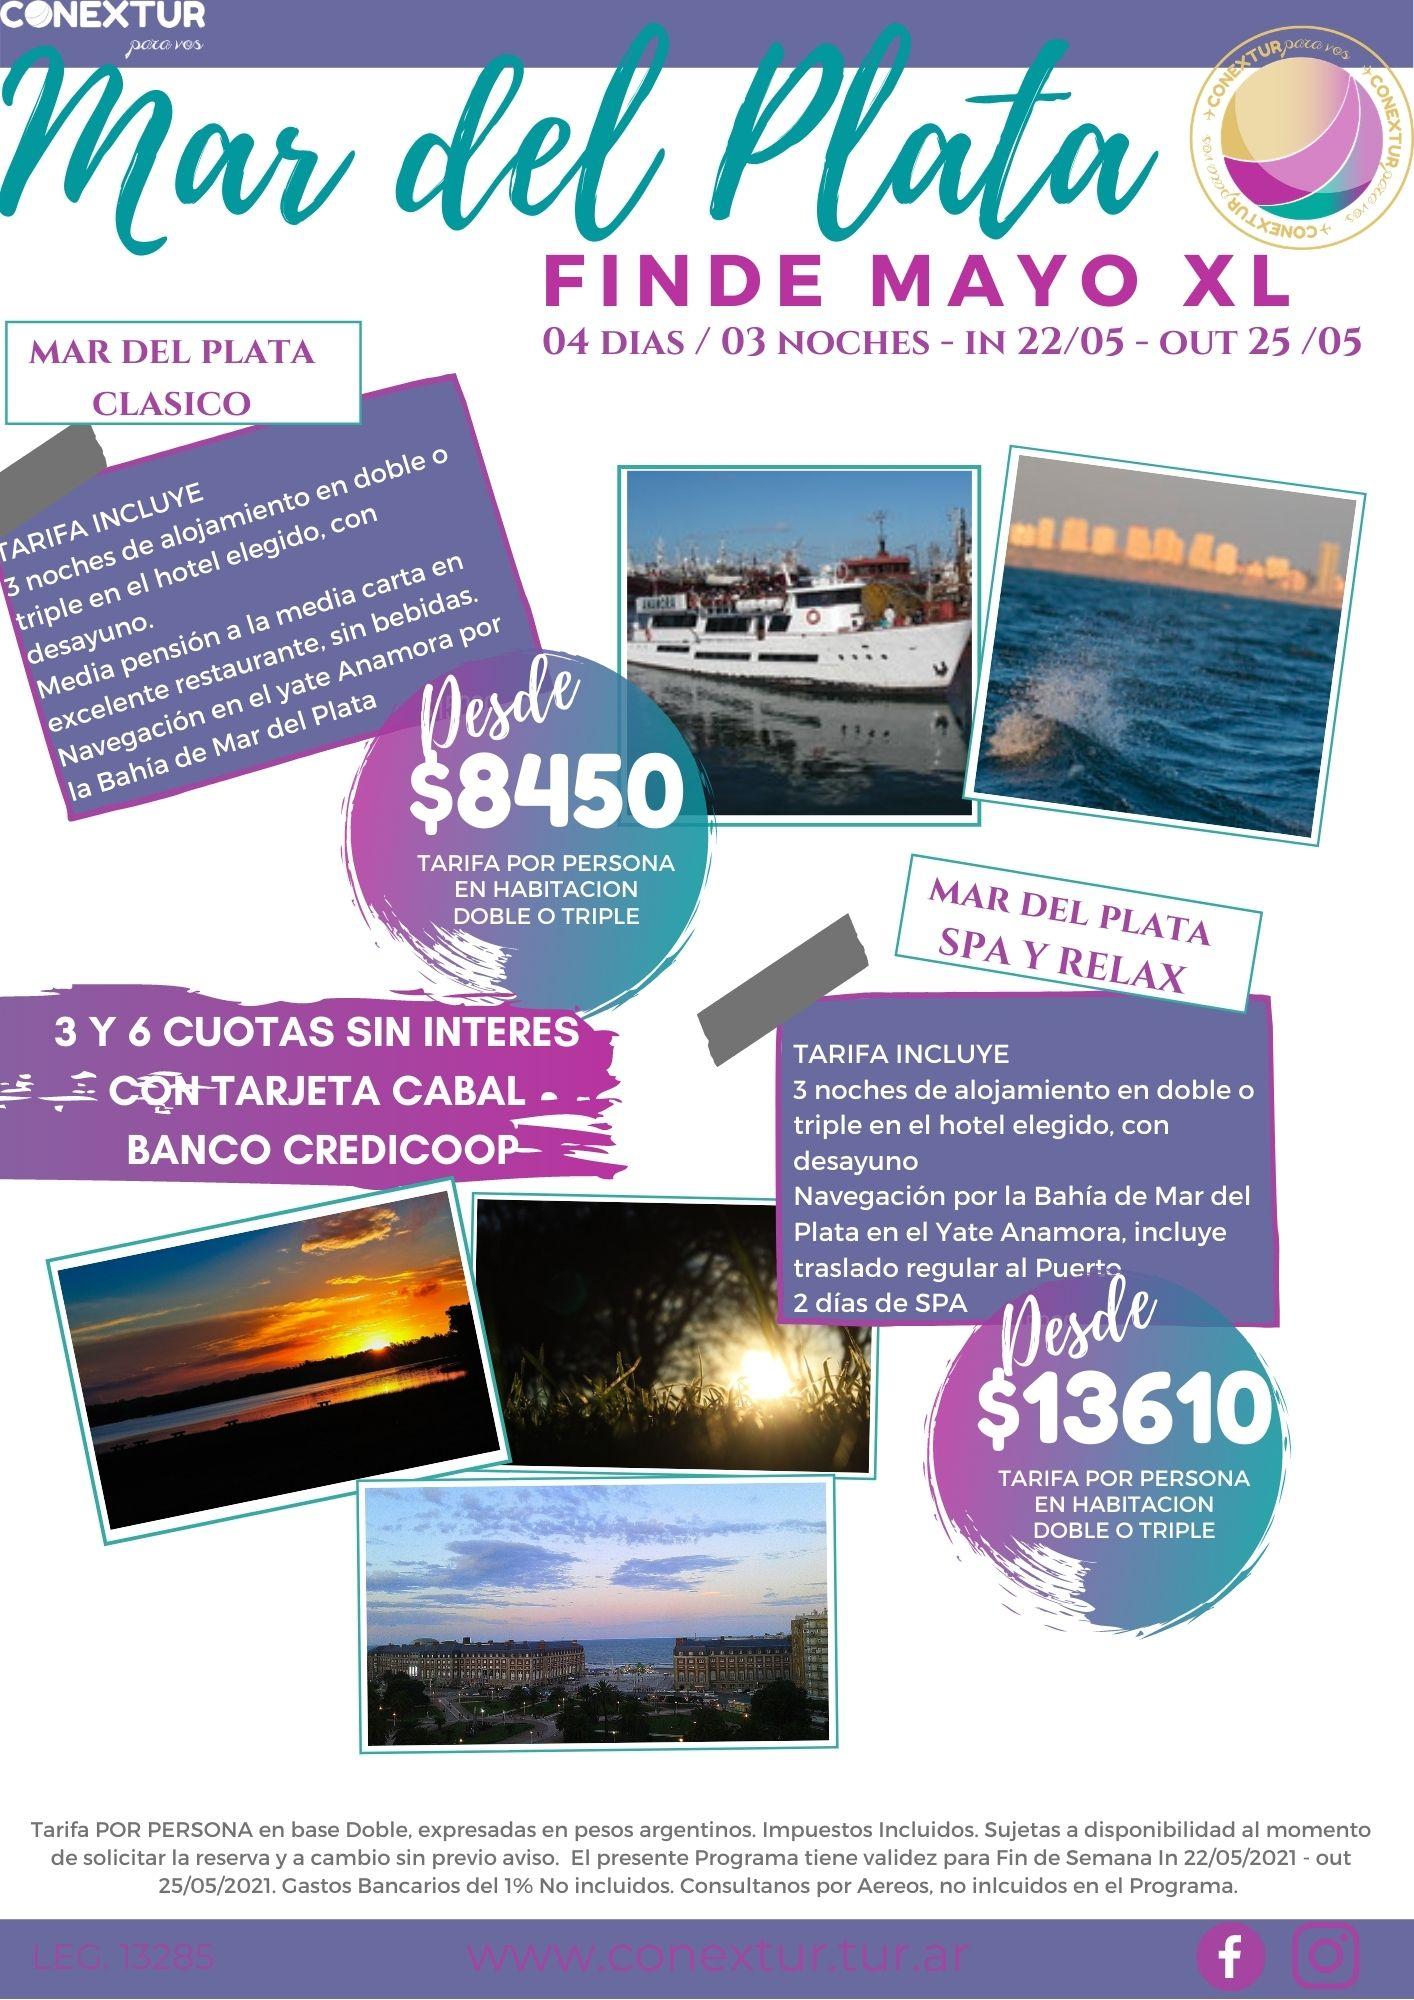 Mar del Plata Spa Y Relax